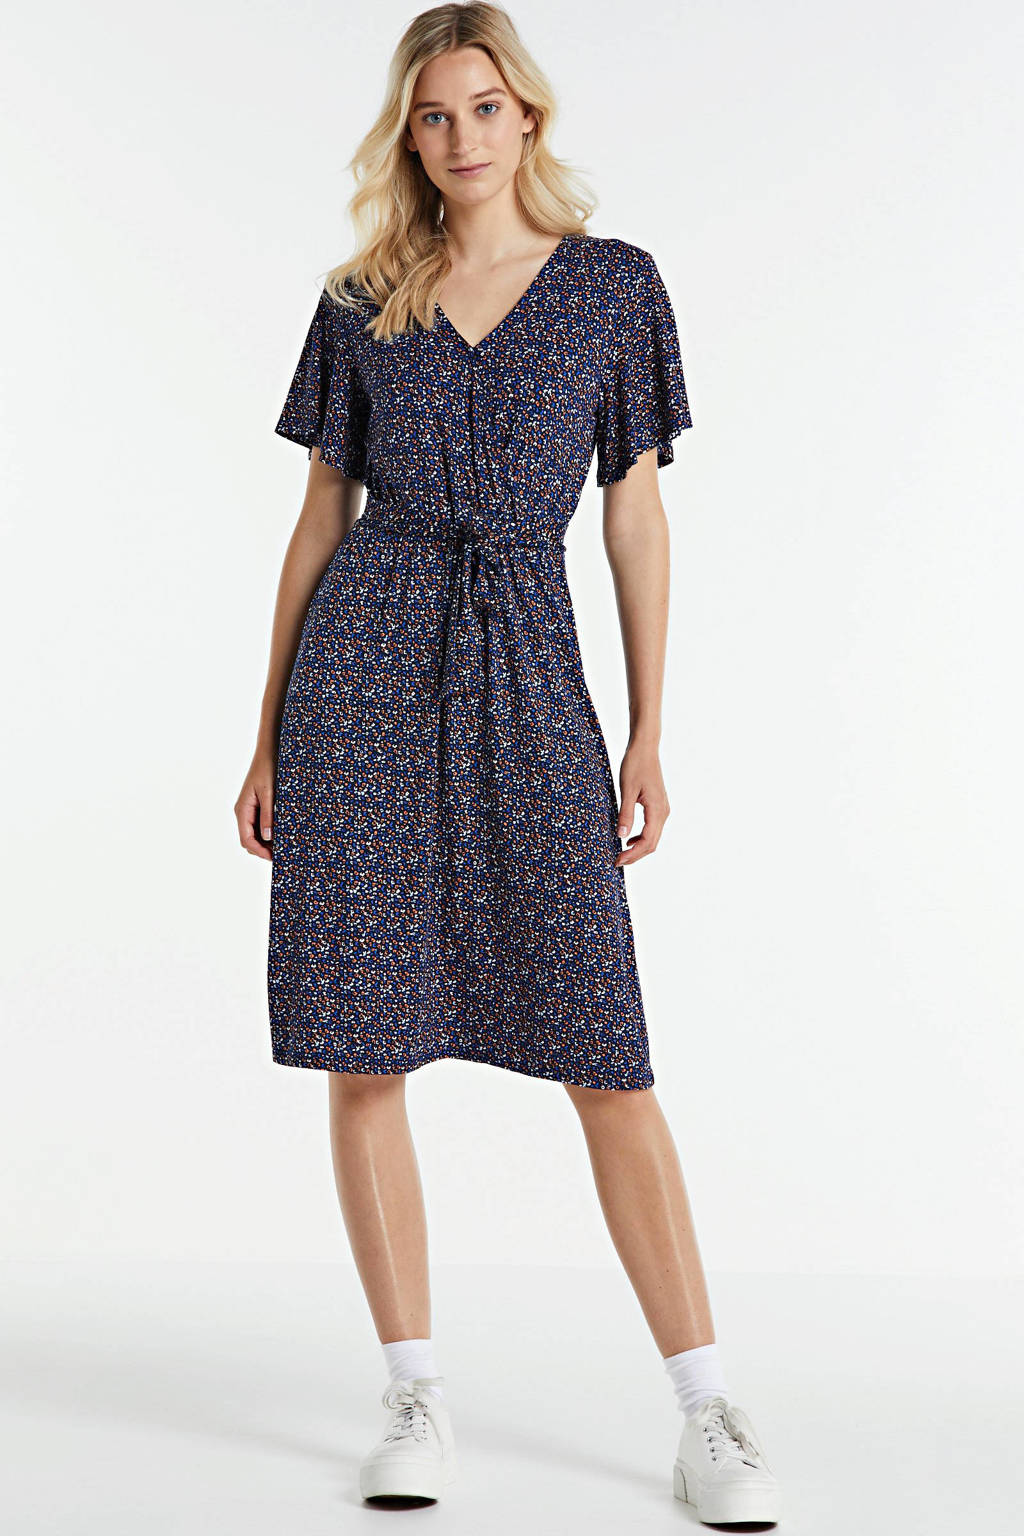 FREEQUENT jurk met all over print en ceintuur blauw/multi, Blauw/multi